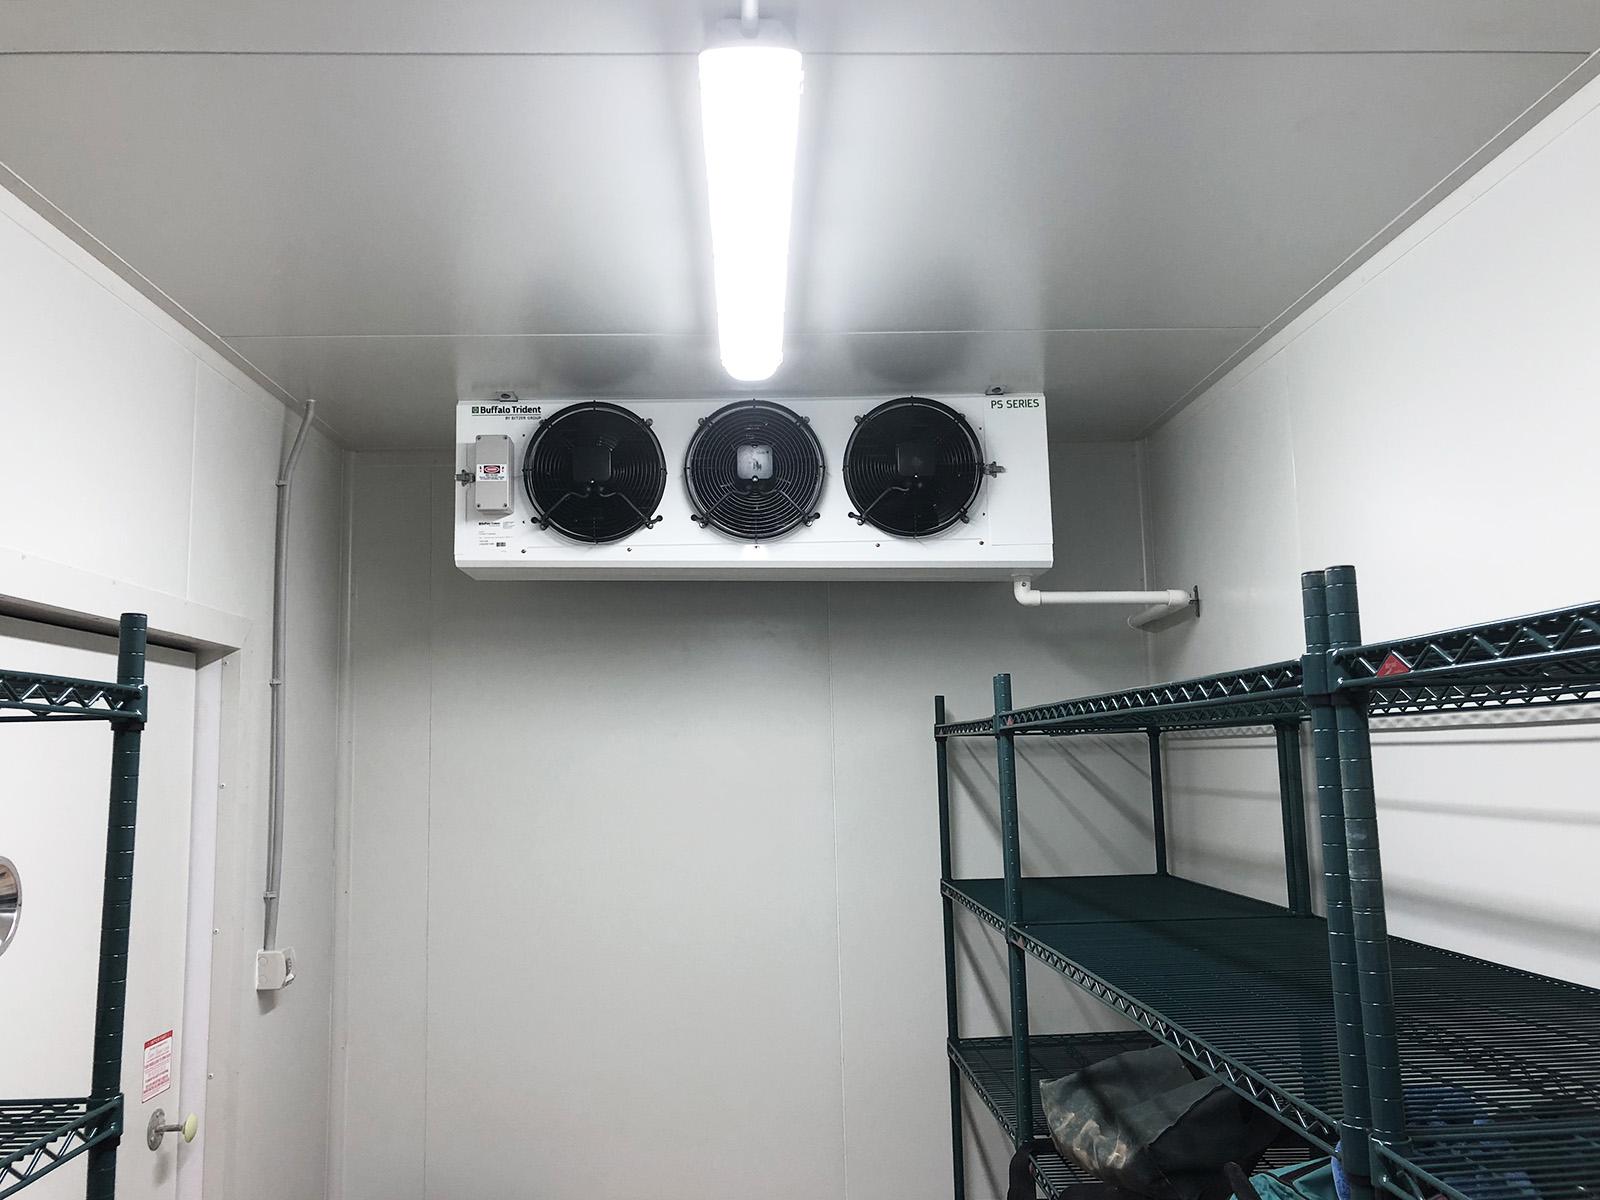 Storage_Coolroom_Refrigeration_Evaporator.jpg